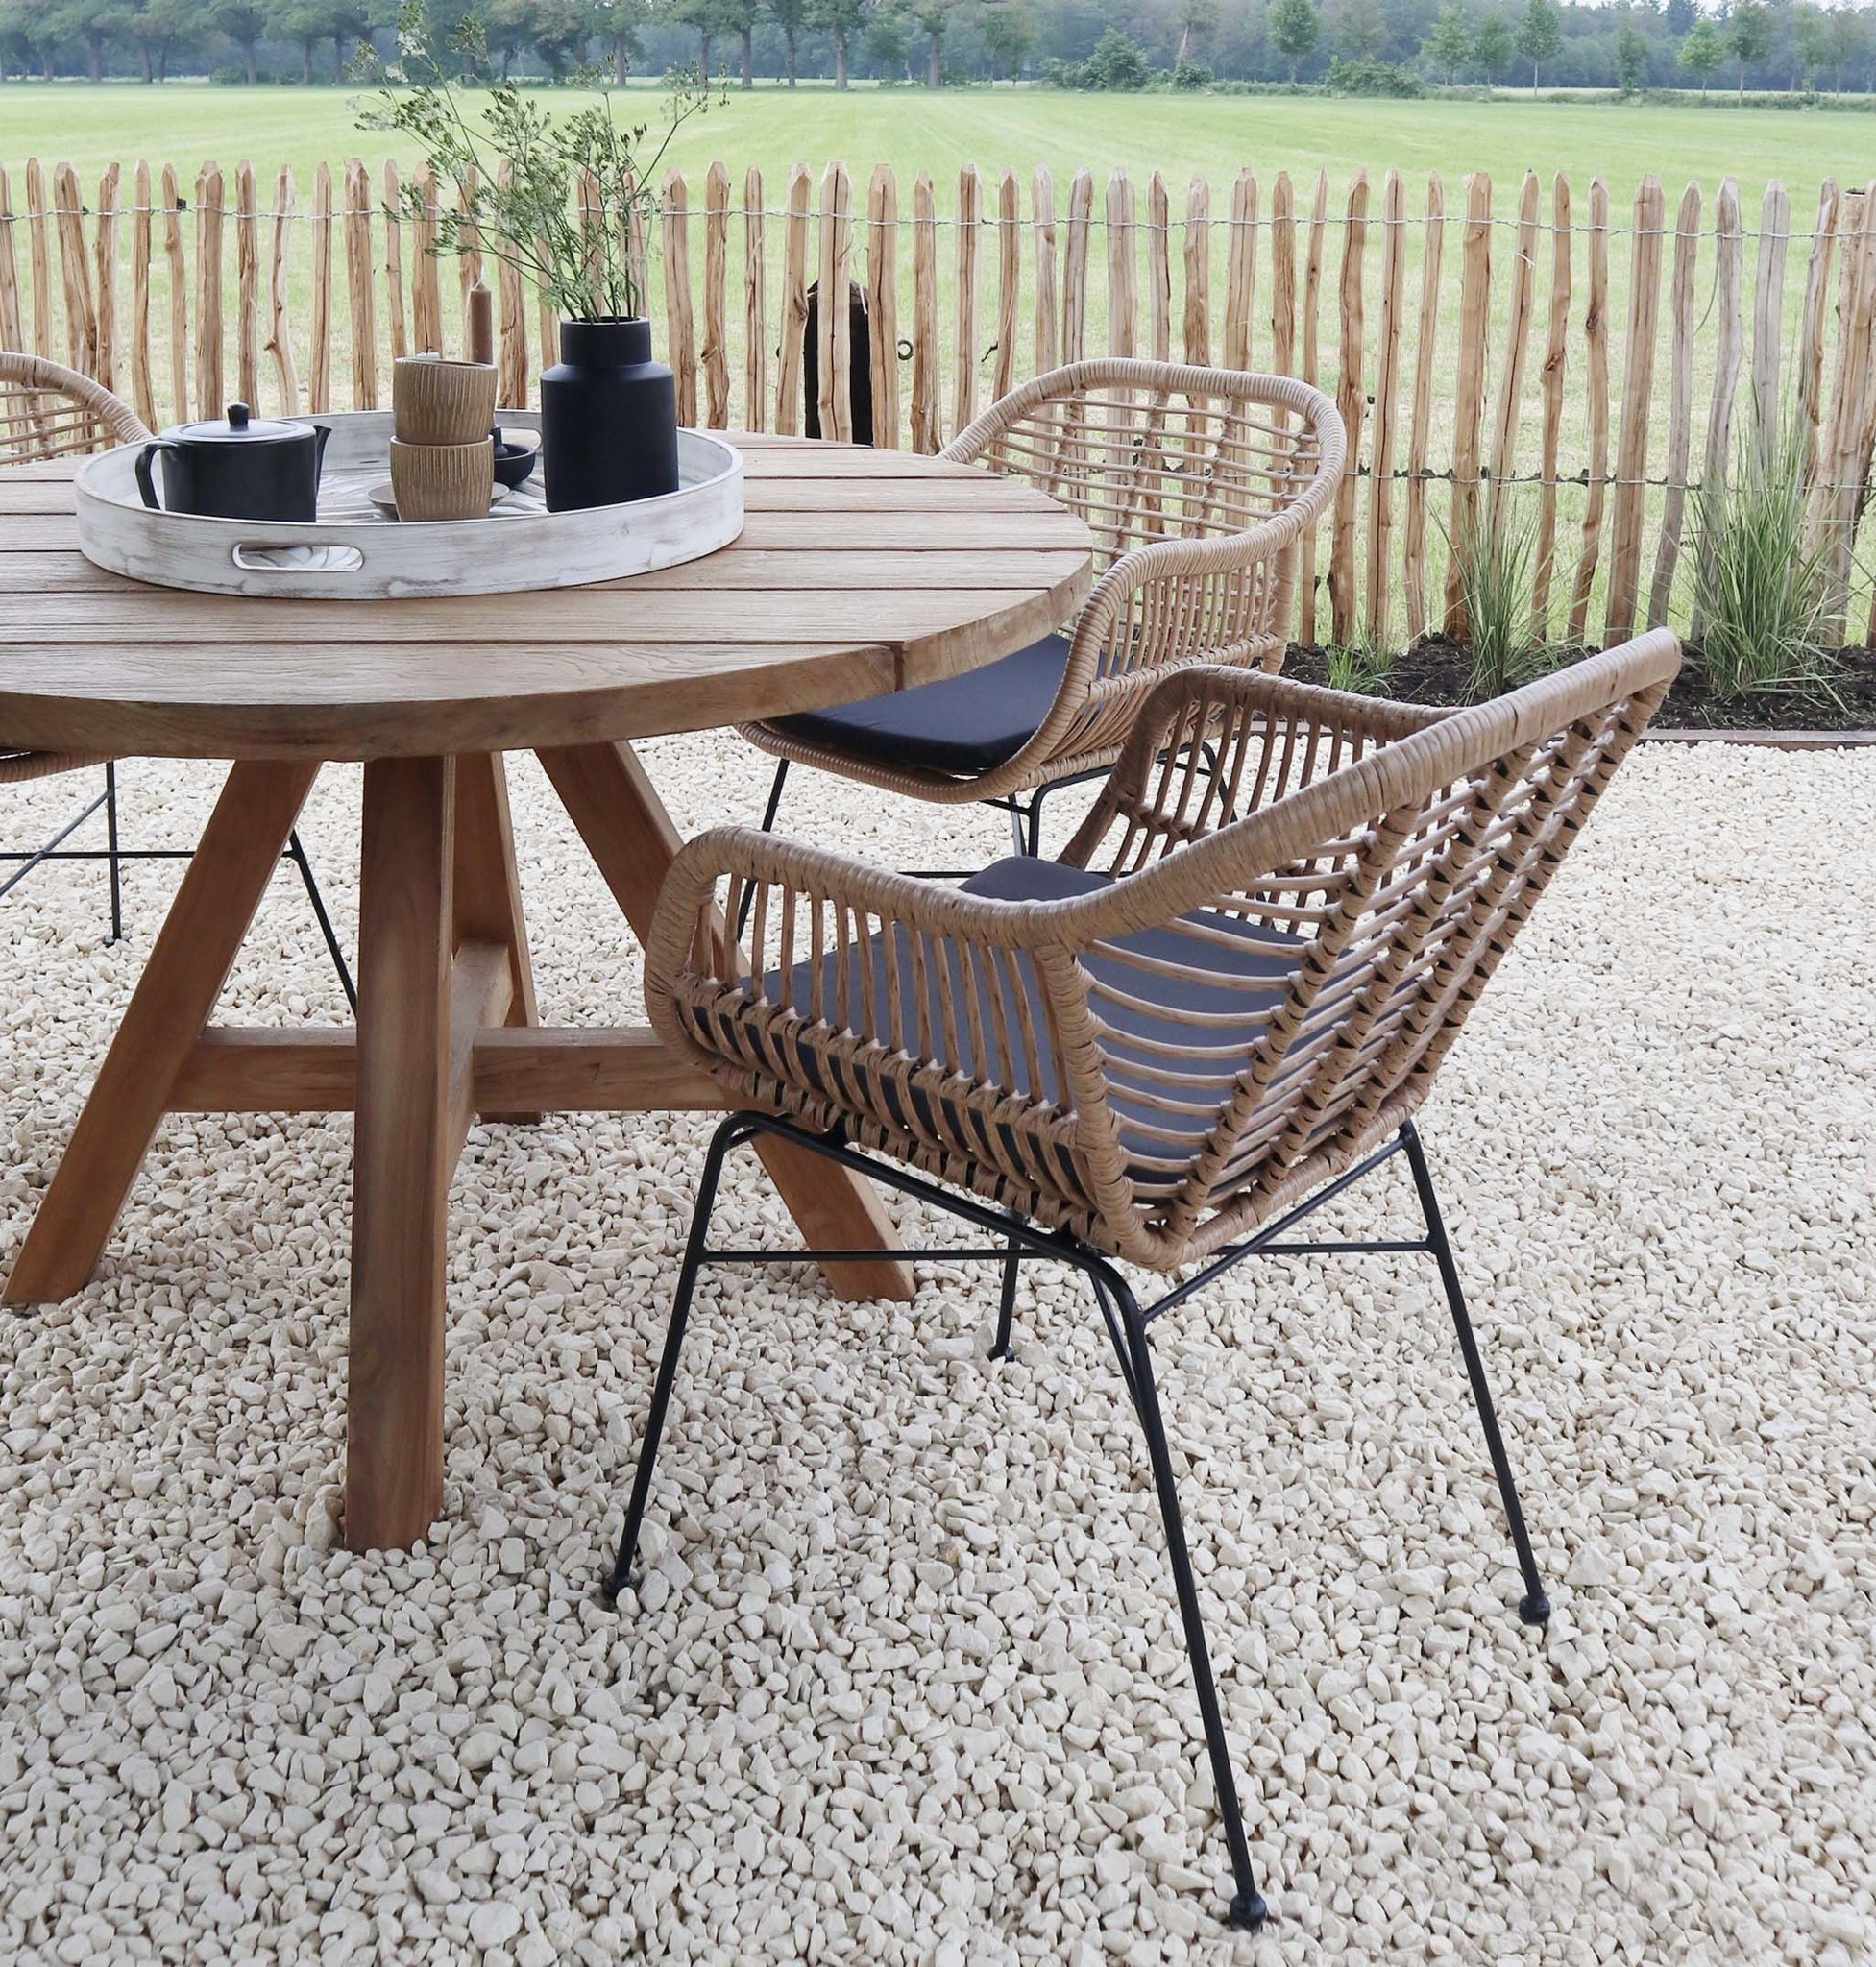 Ronde houten tuintafel